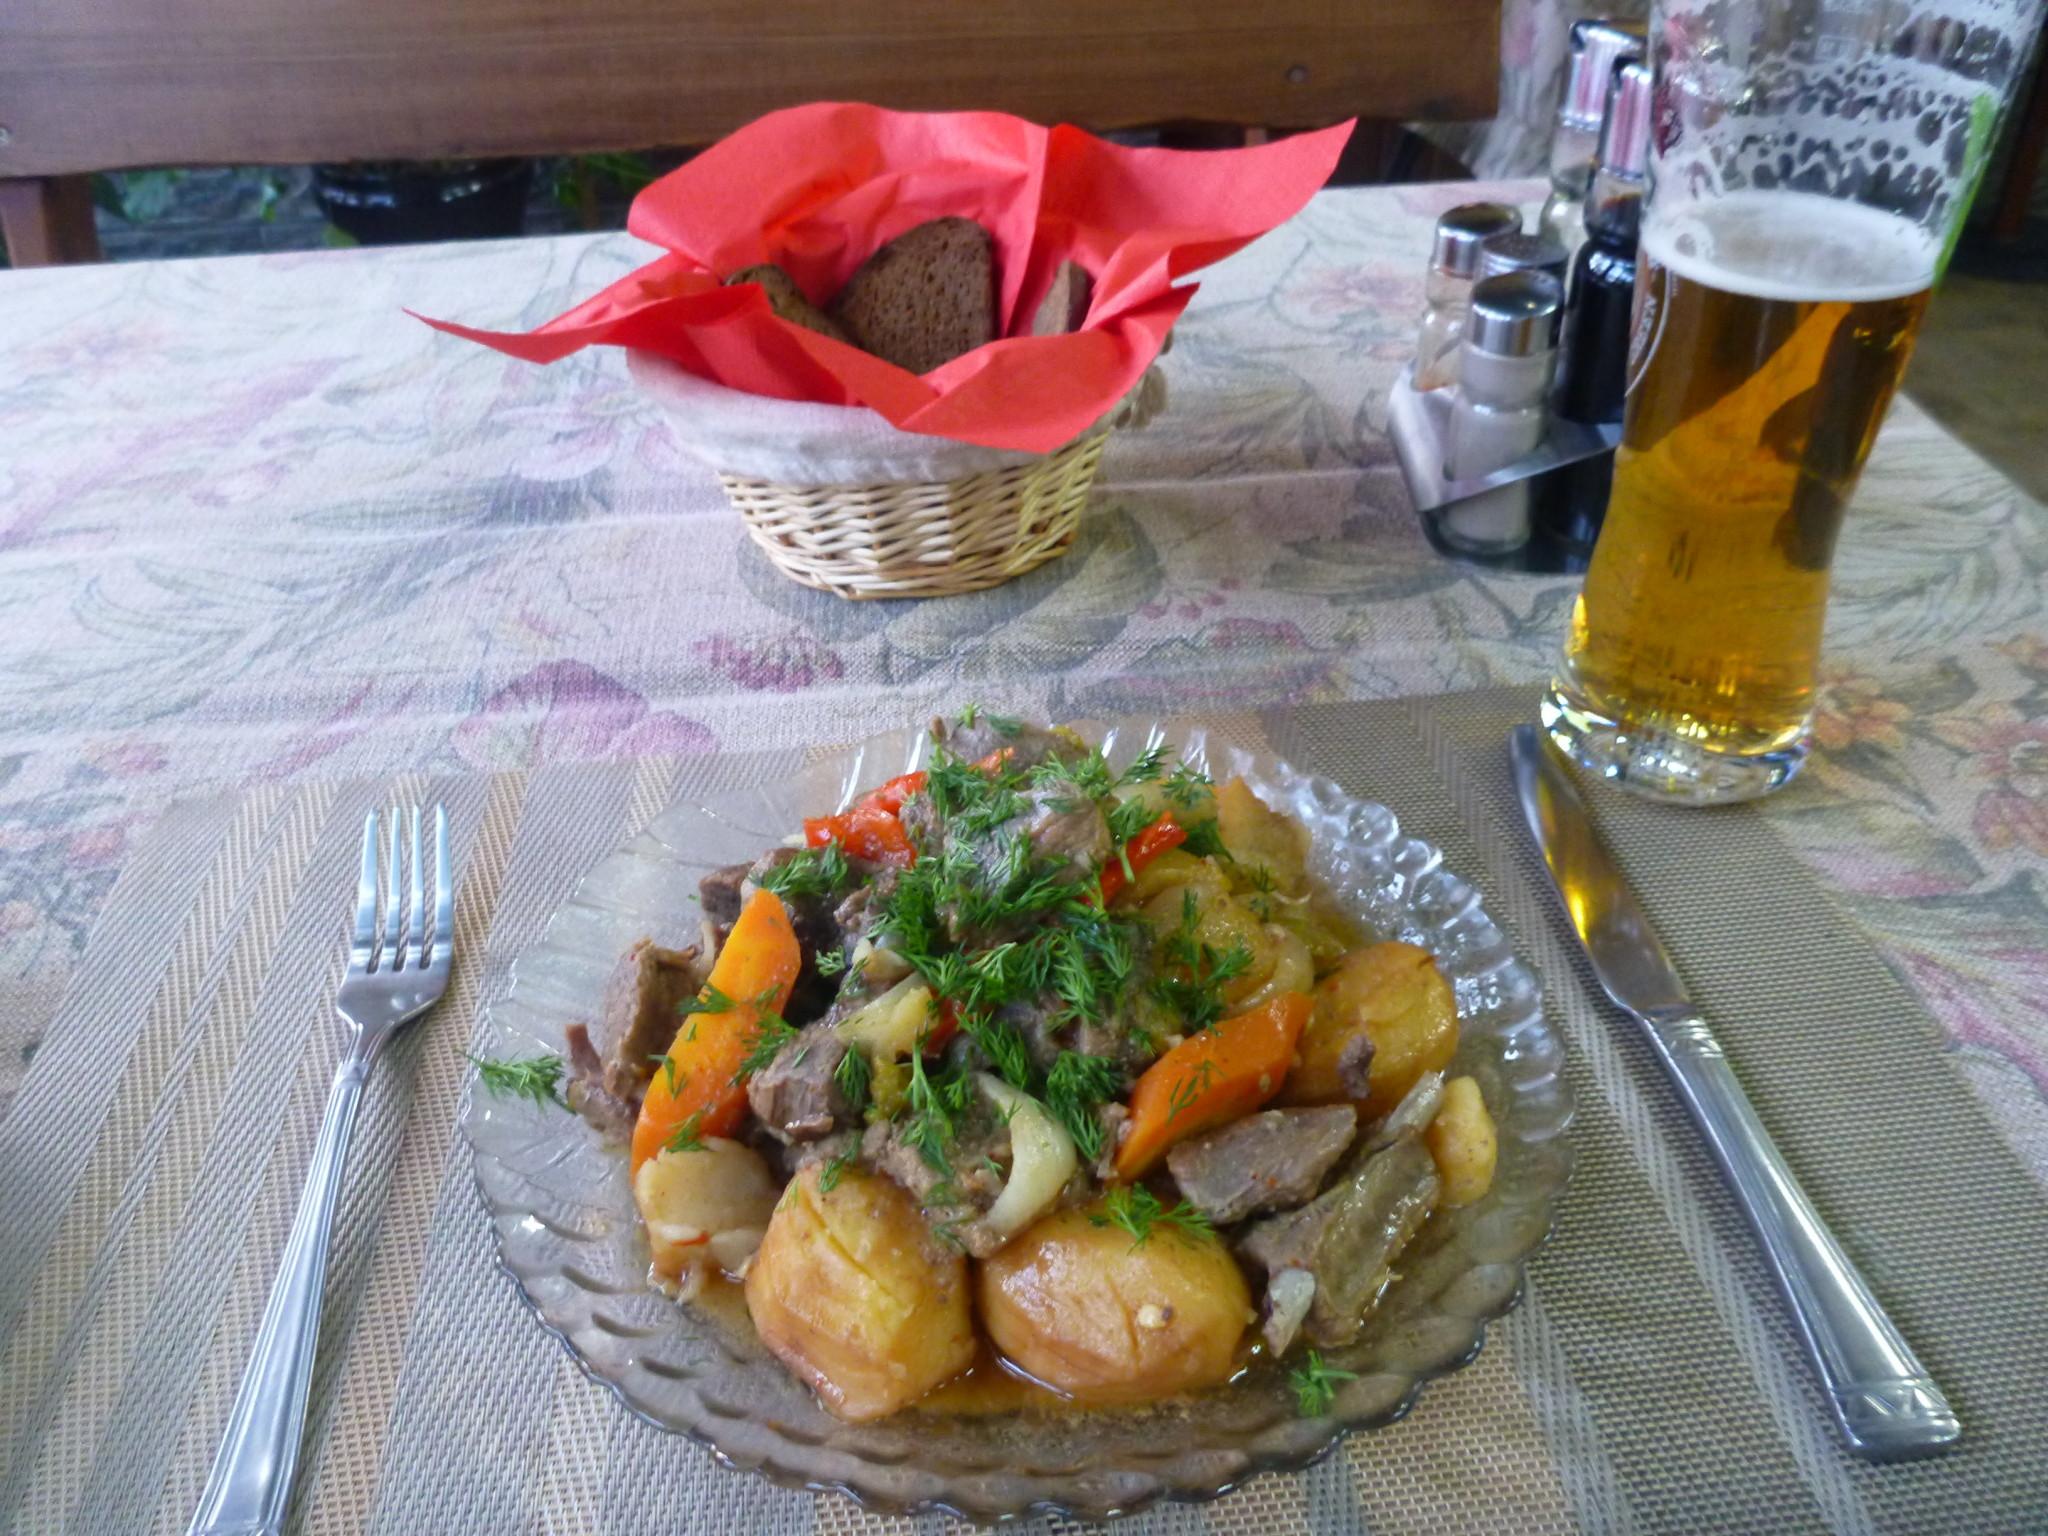 Friday's Featured Food: Wild Boar Roast at Orbita Boutique Hotel in Shymkent, Kazakhstan